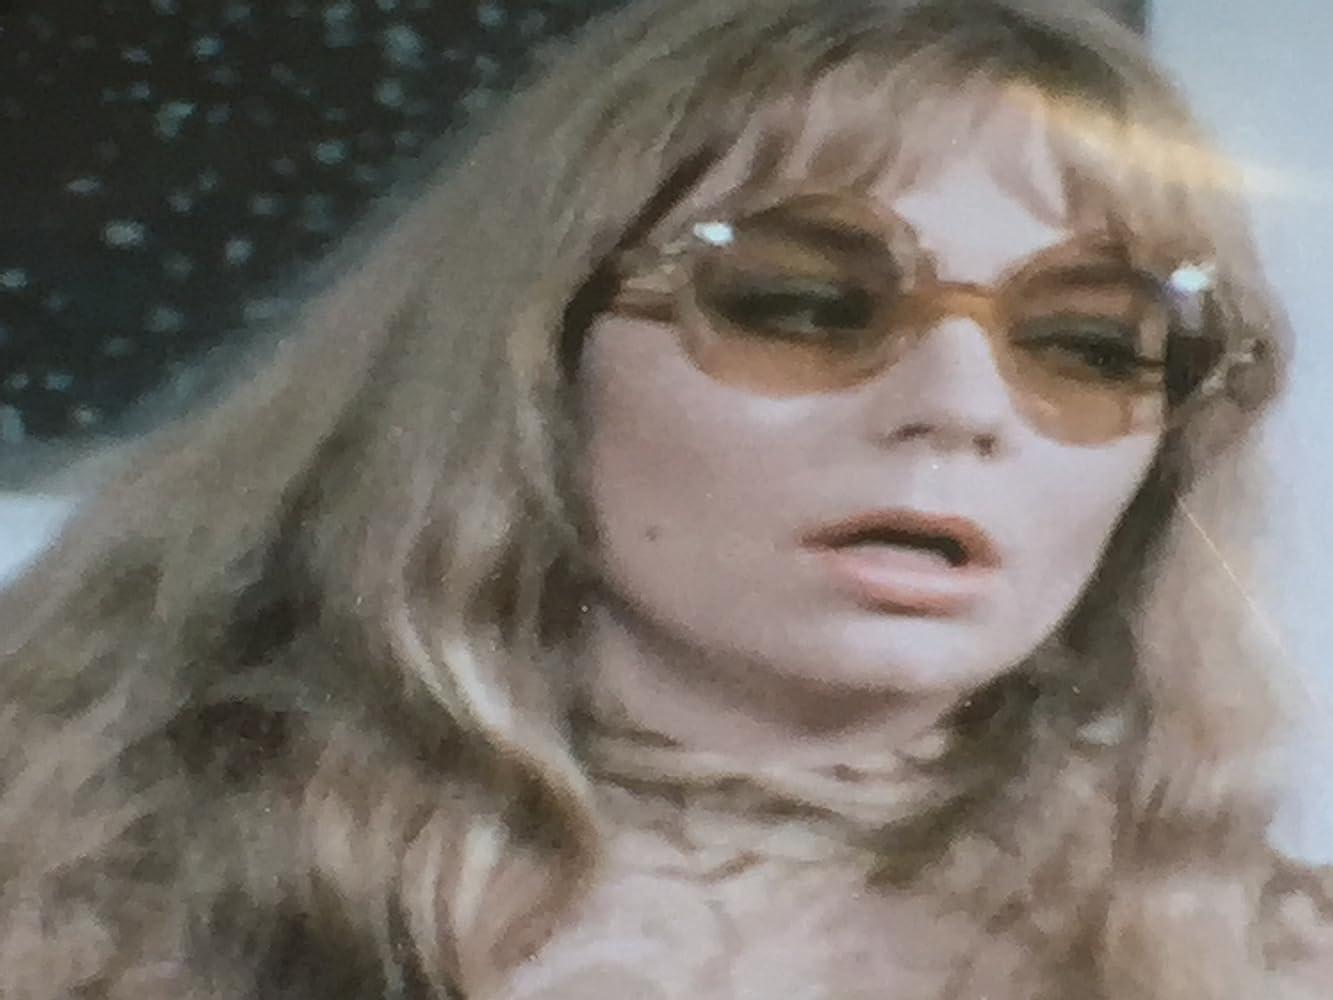 Amanda Redington Erotic movies Sydne Rome,Ami Dolenz